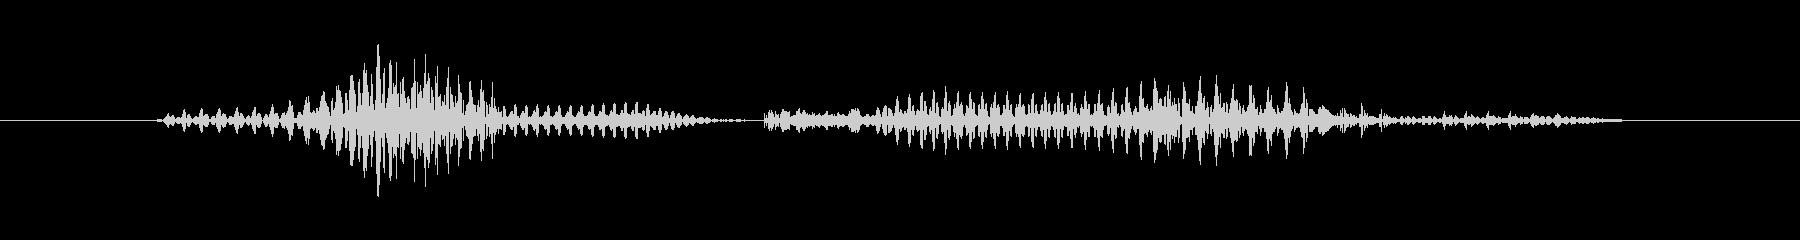 「1 PM」英語発音の未再生の波形